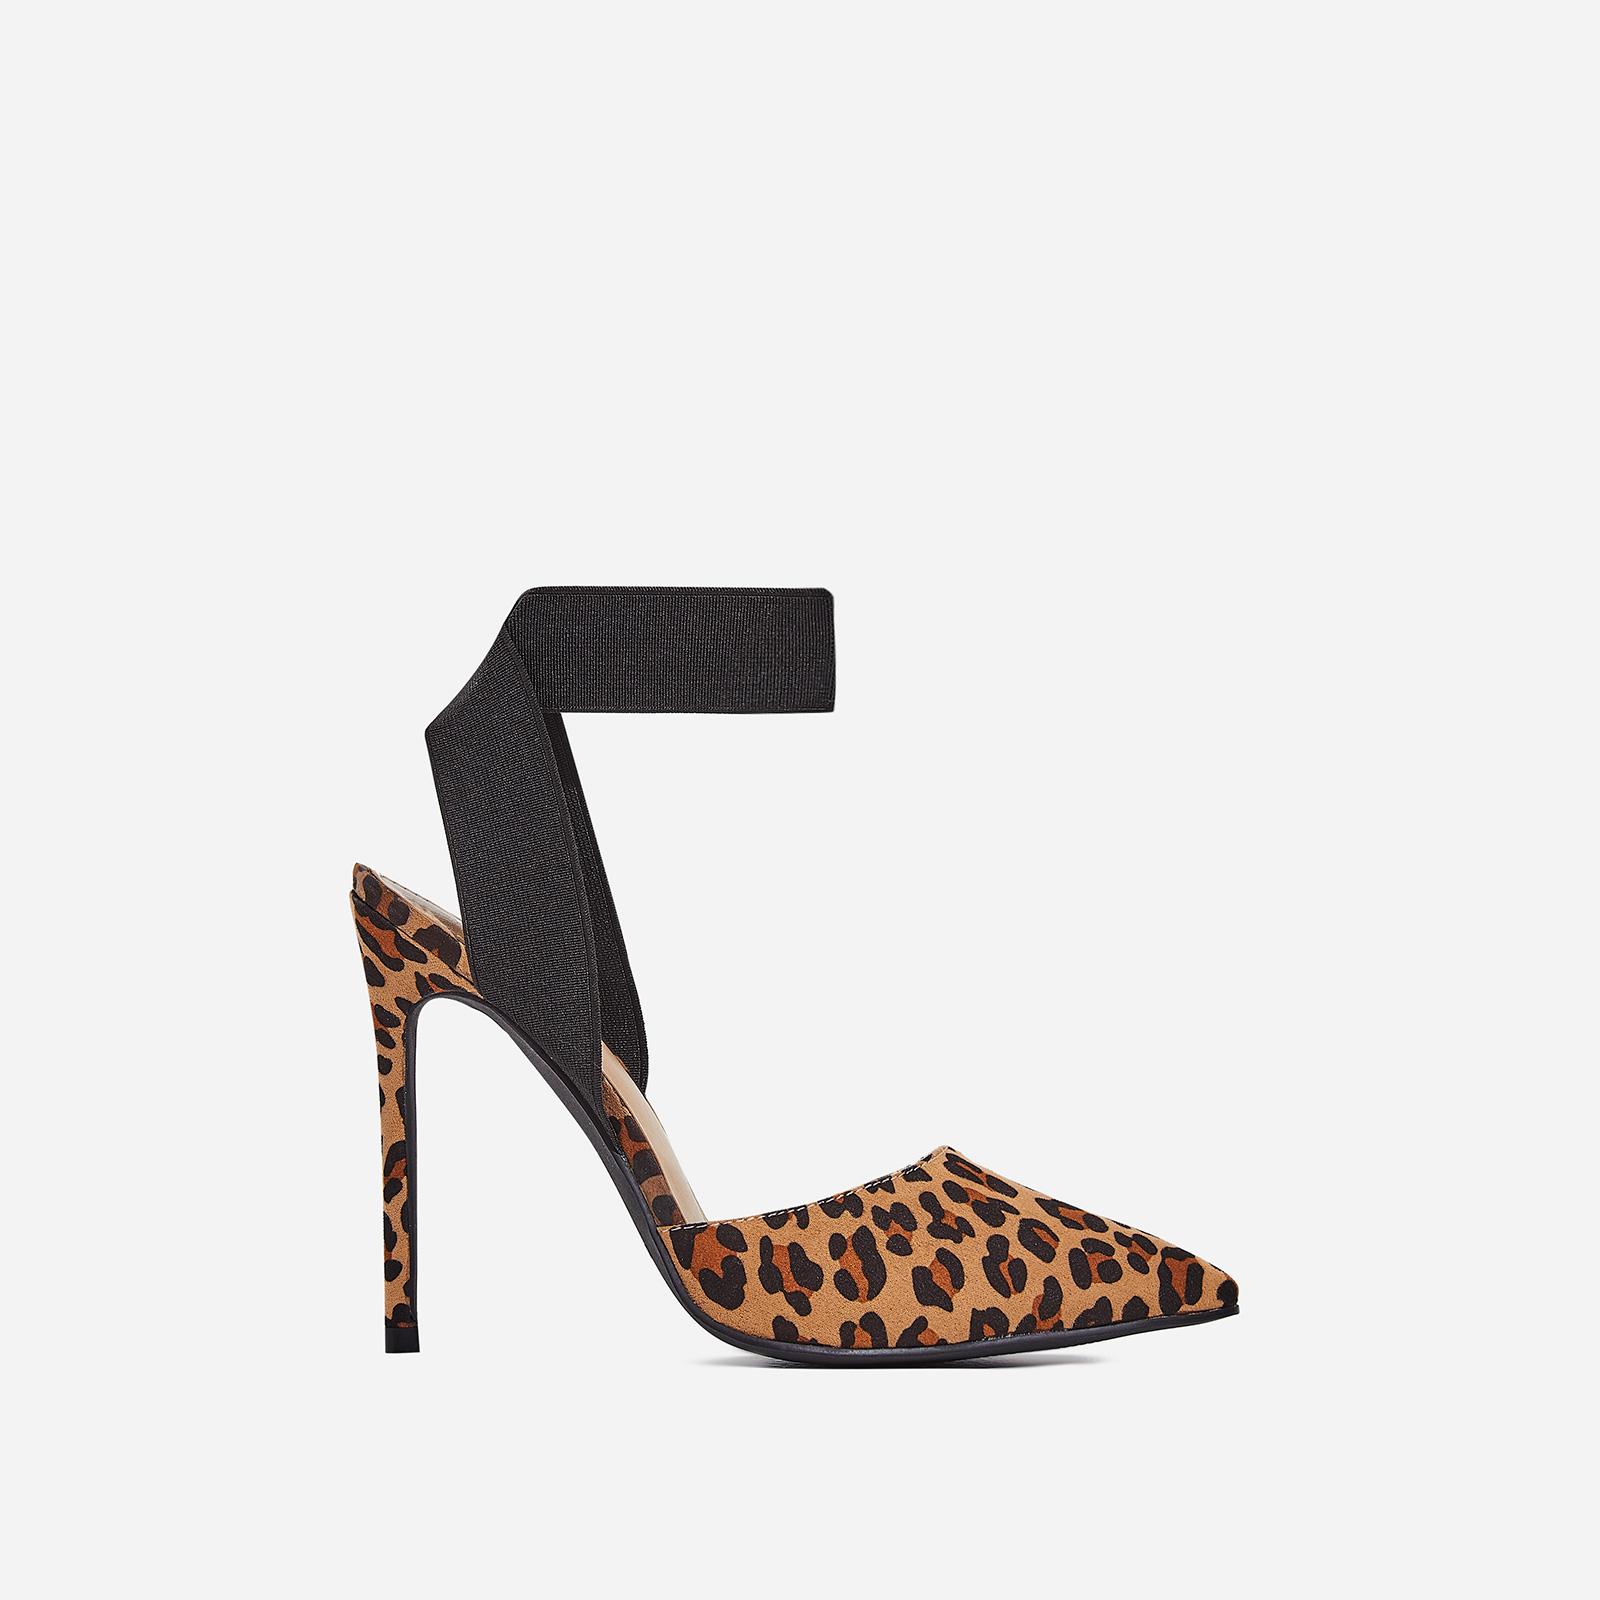 Alina Elasticated Court Heel In Tan Leopard Print Faux Suede